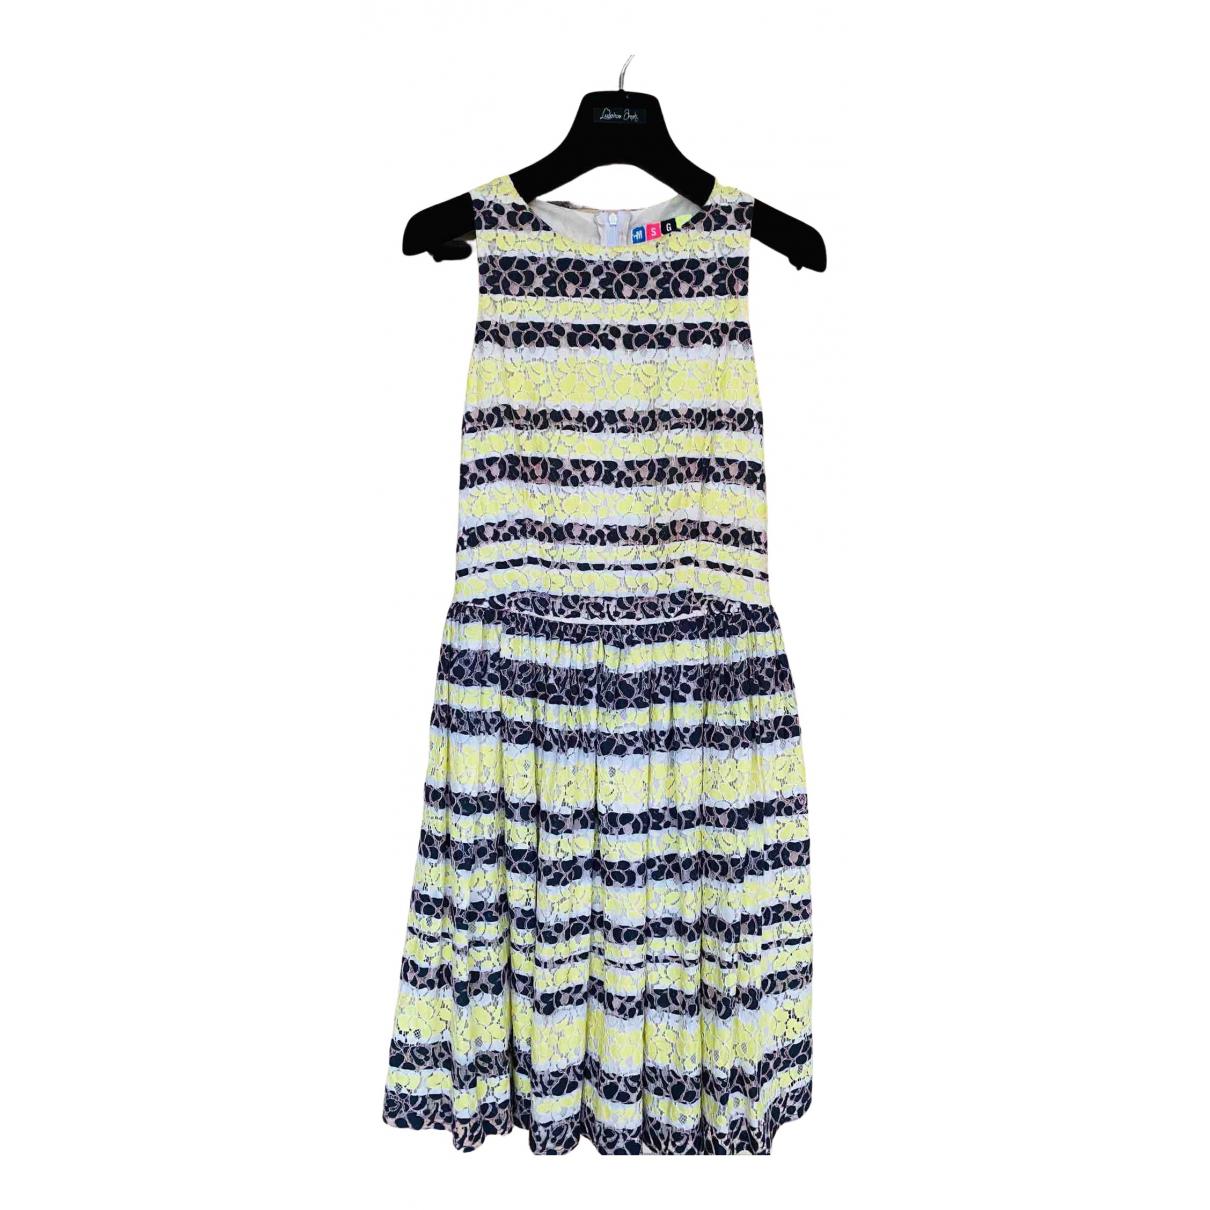 Msgm N Yellow Cotton dress for Women 38 IT